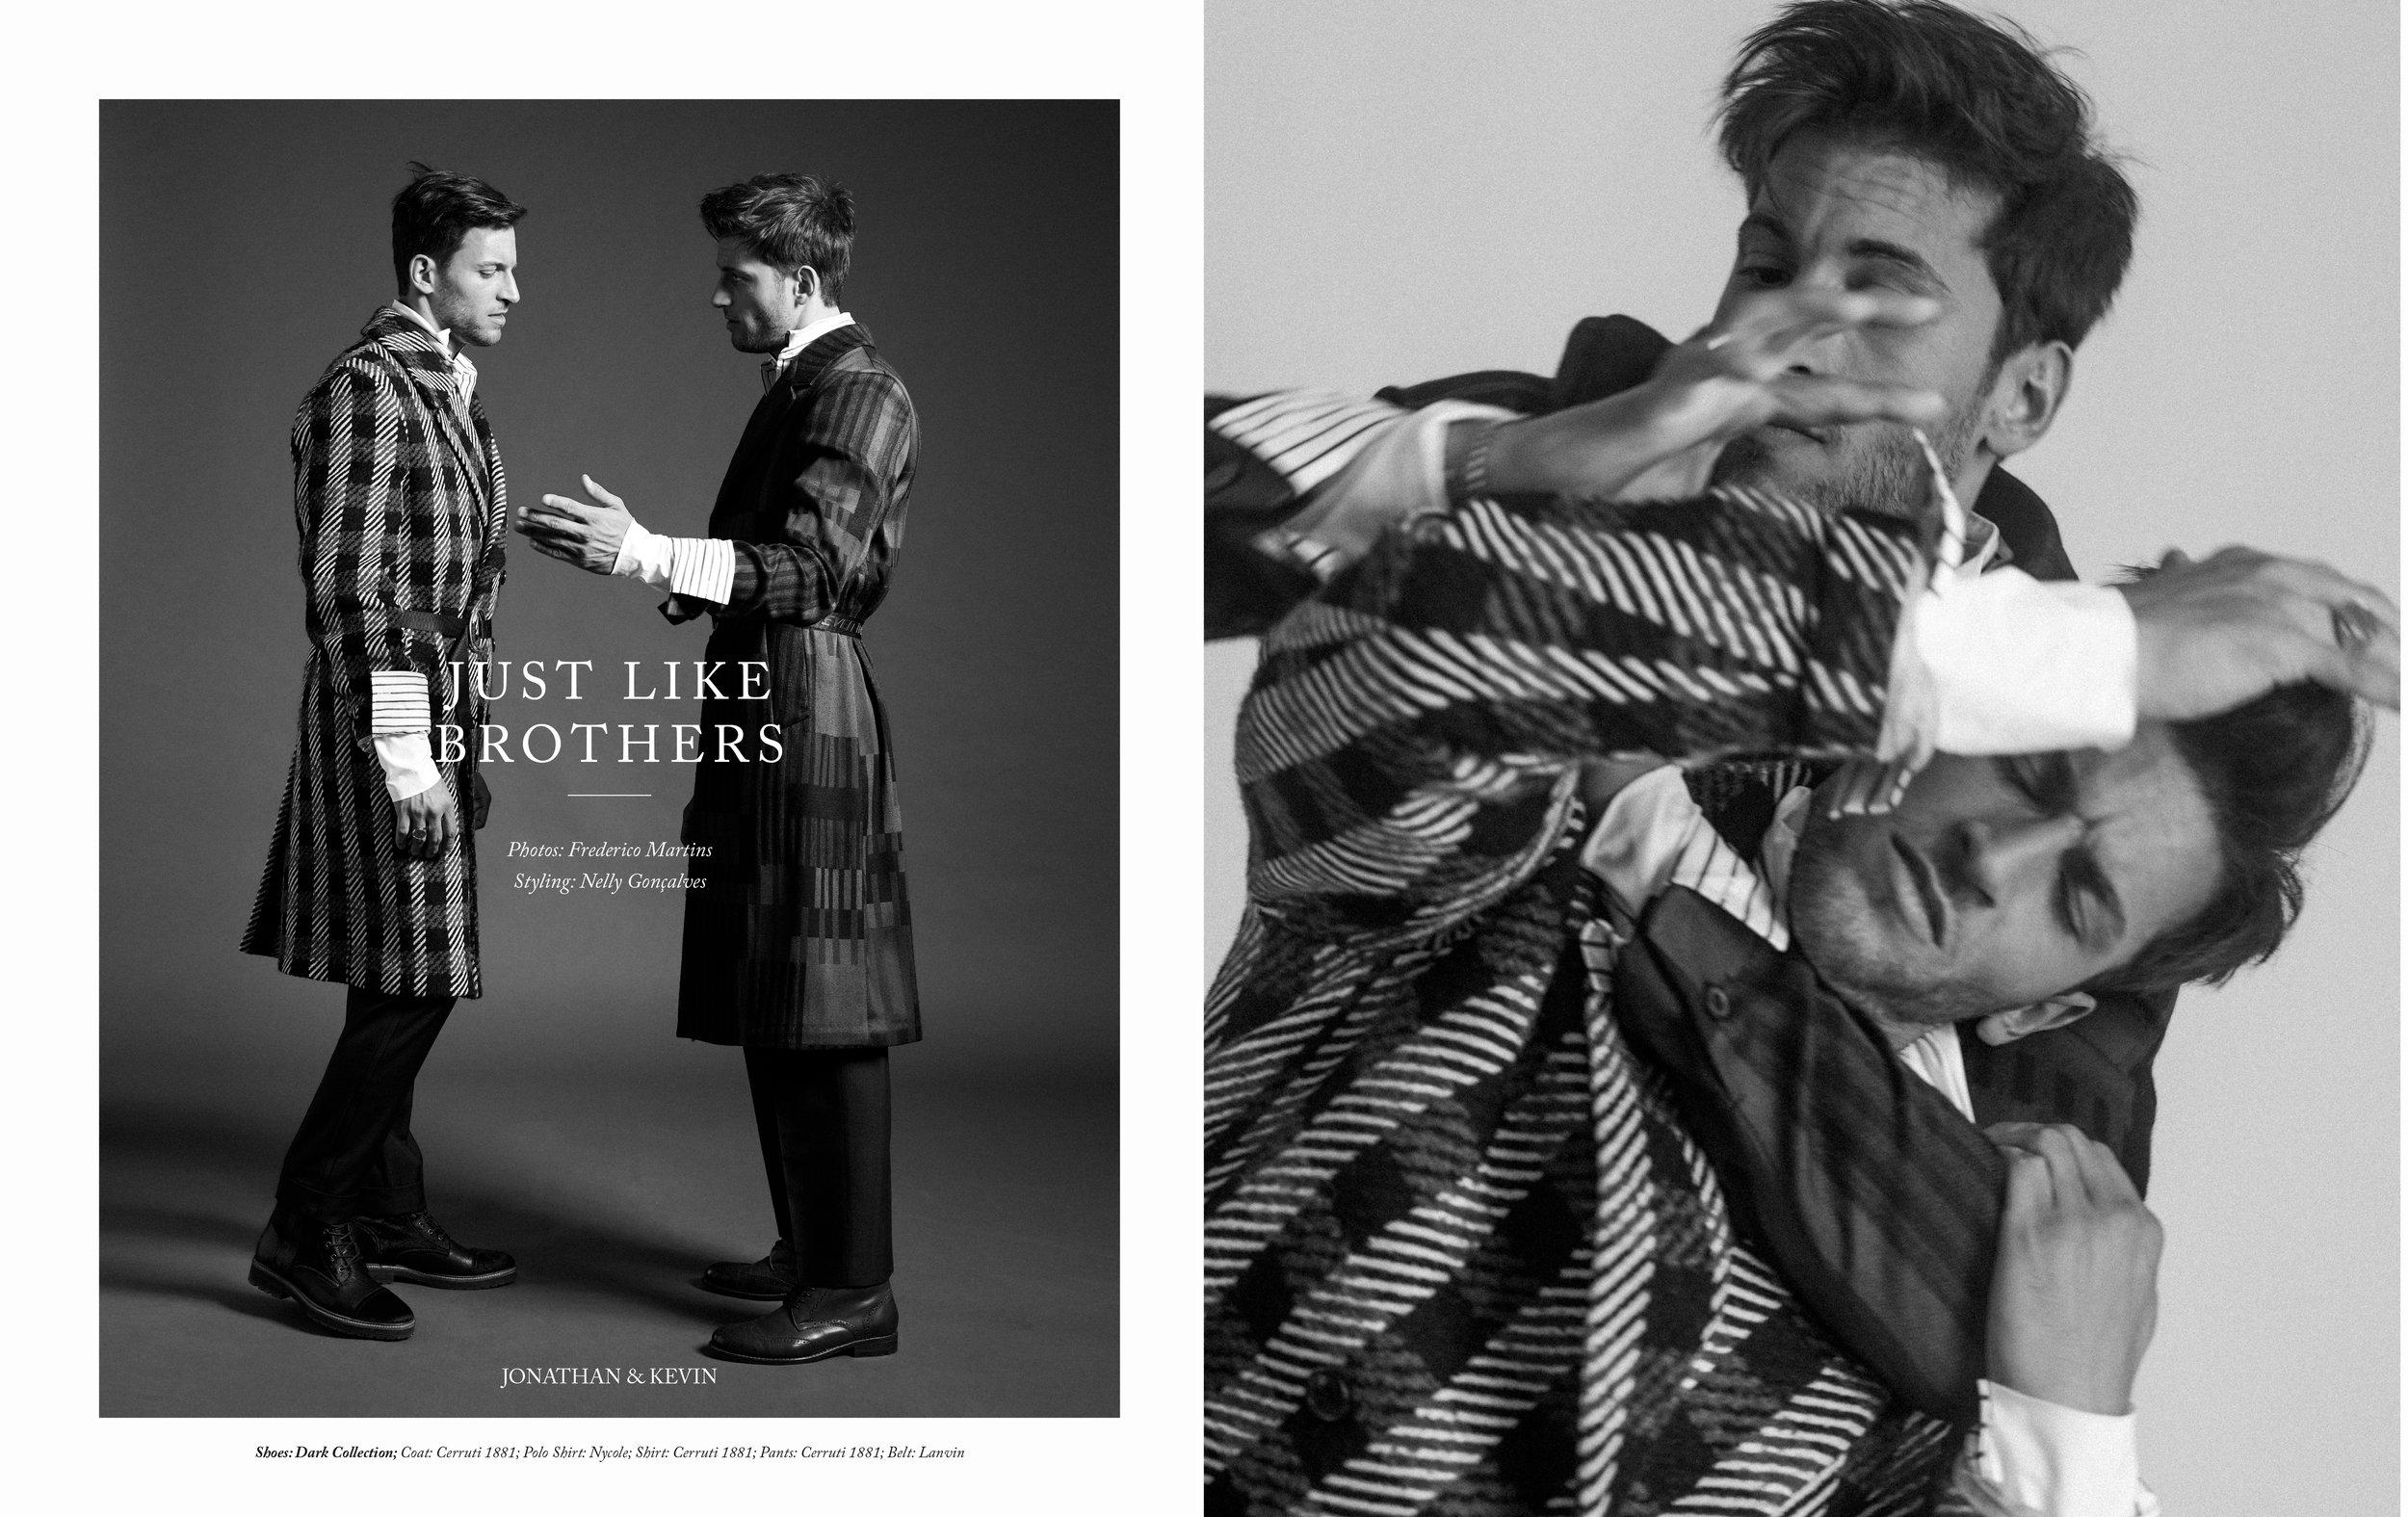 Just Like Brothers, Frederico Martins, Kevin Sampaio, Jonathan Sampaio, Twins, Lalaland